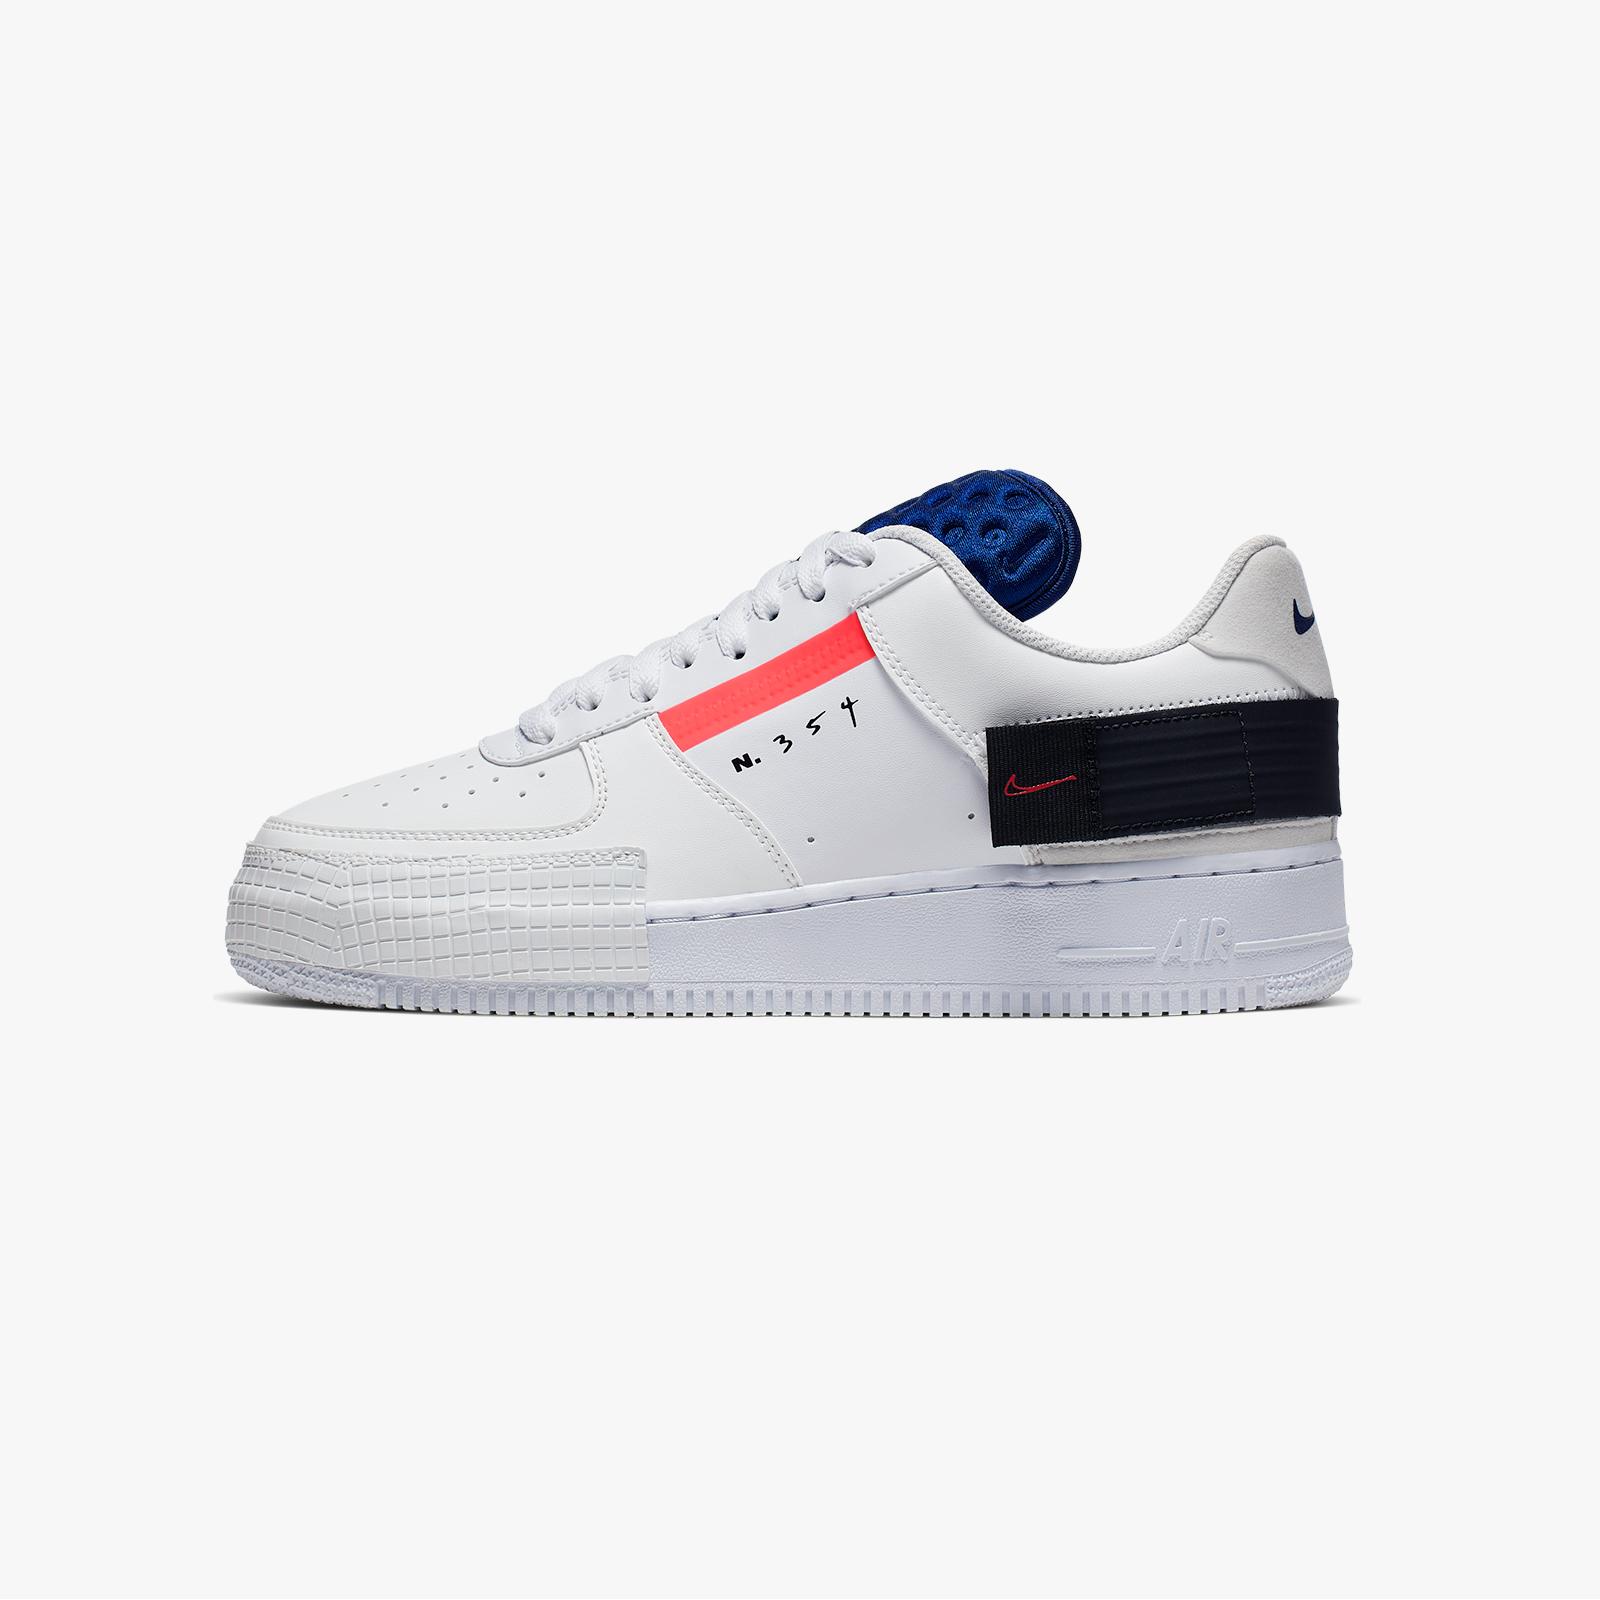 CI0054 100 Nike Air Force 1 Type 1